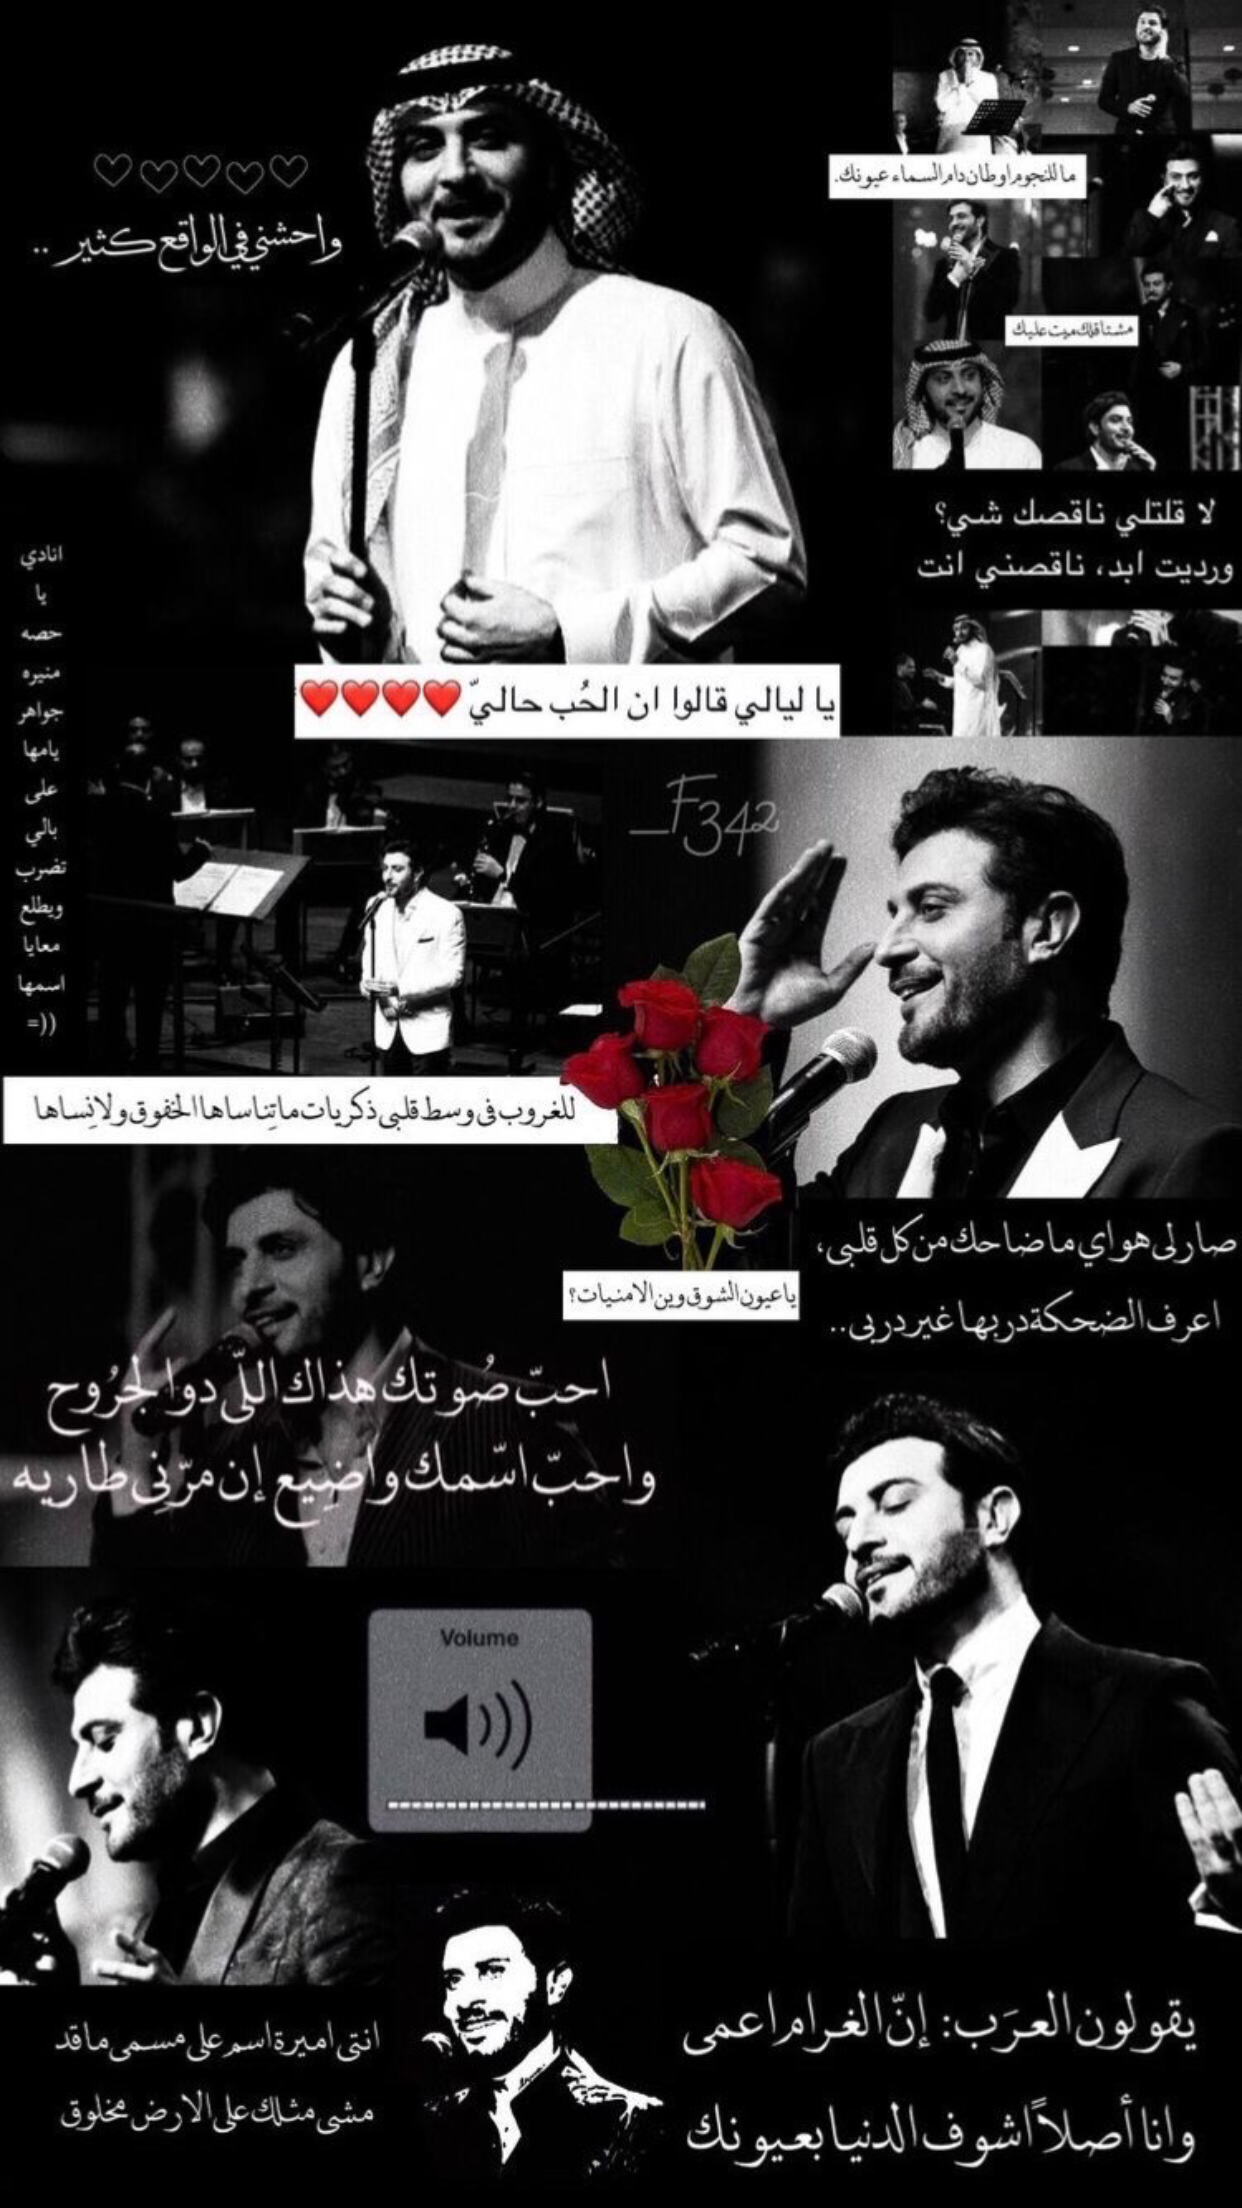 كتابات صور Cover Photo Quotes Love Smile Quotes Calligraphy Quotes Love